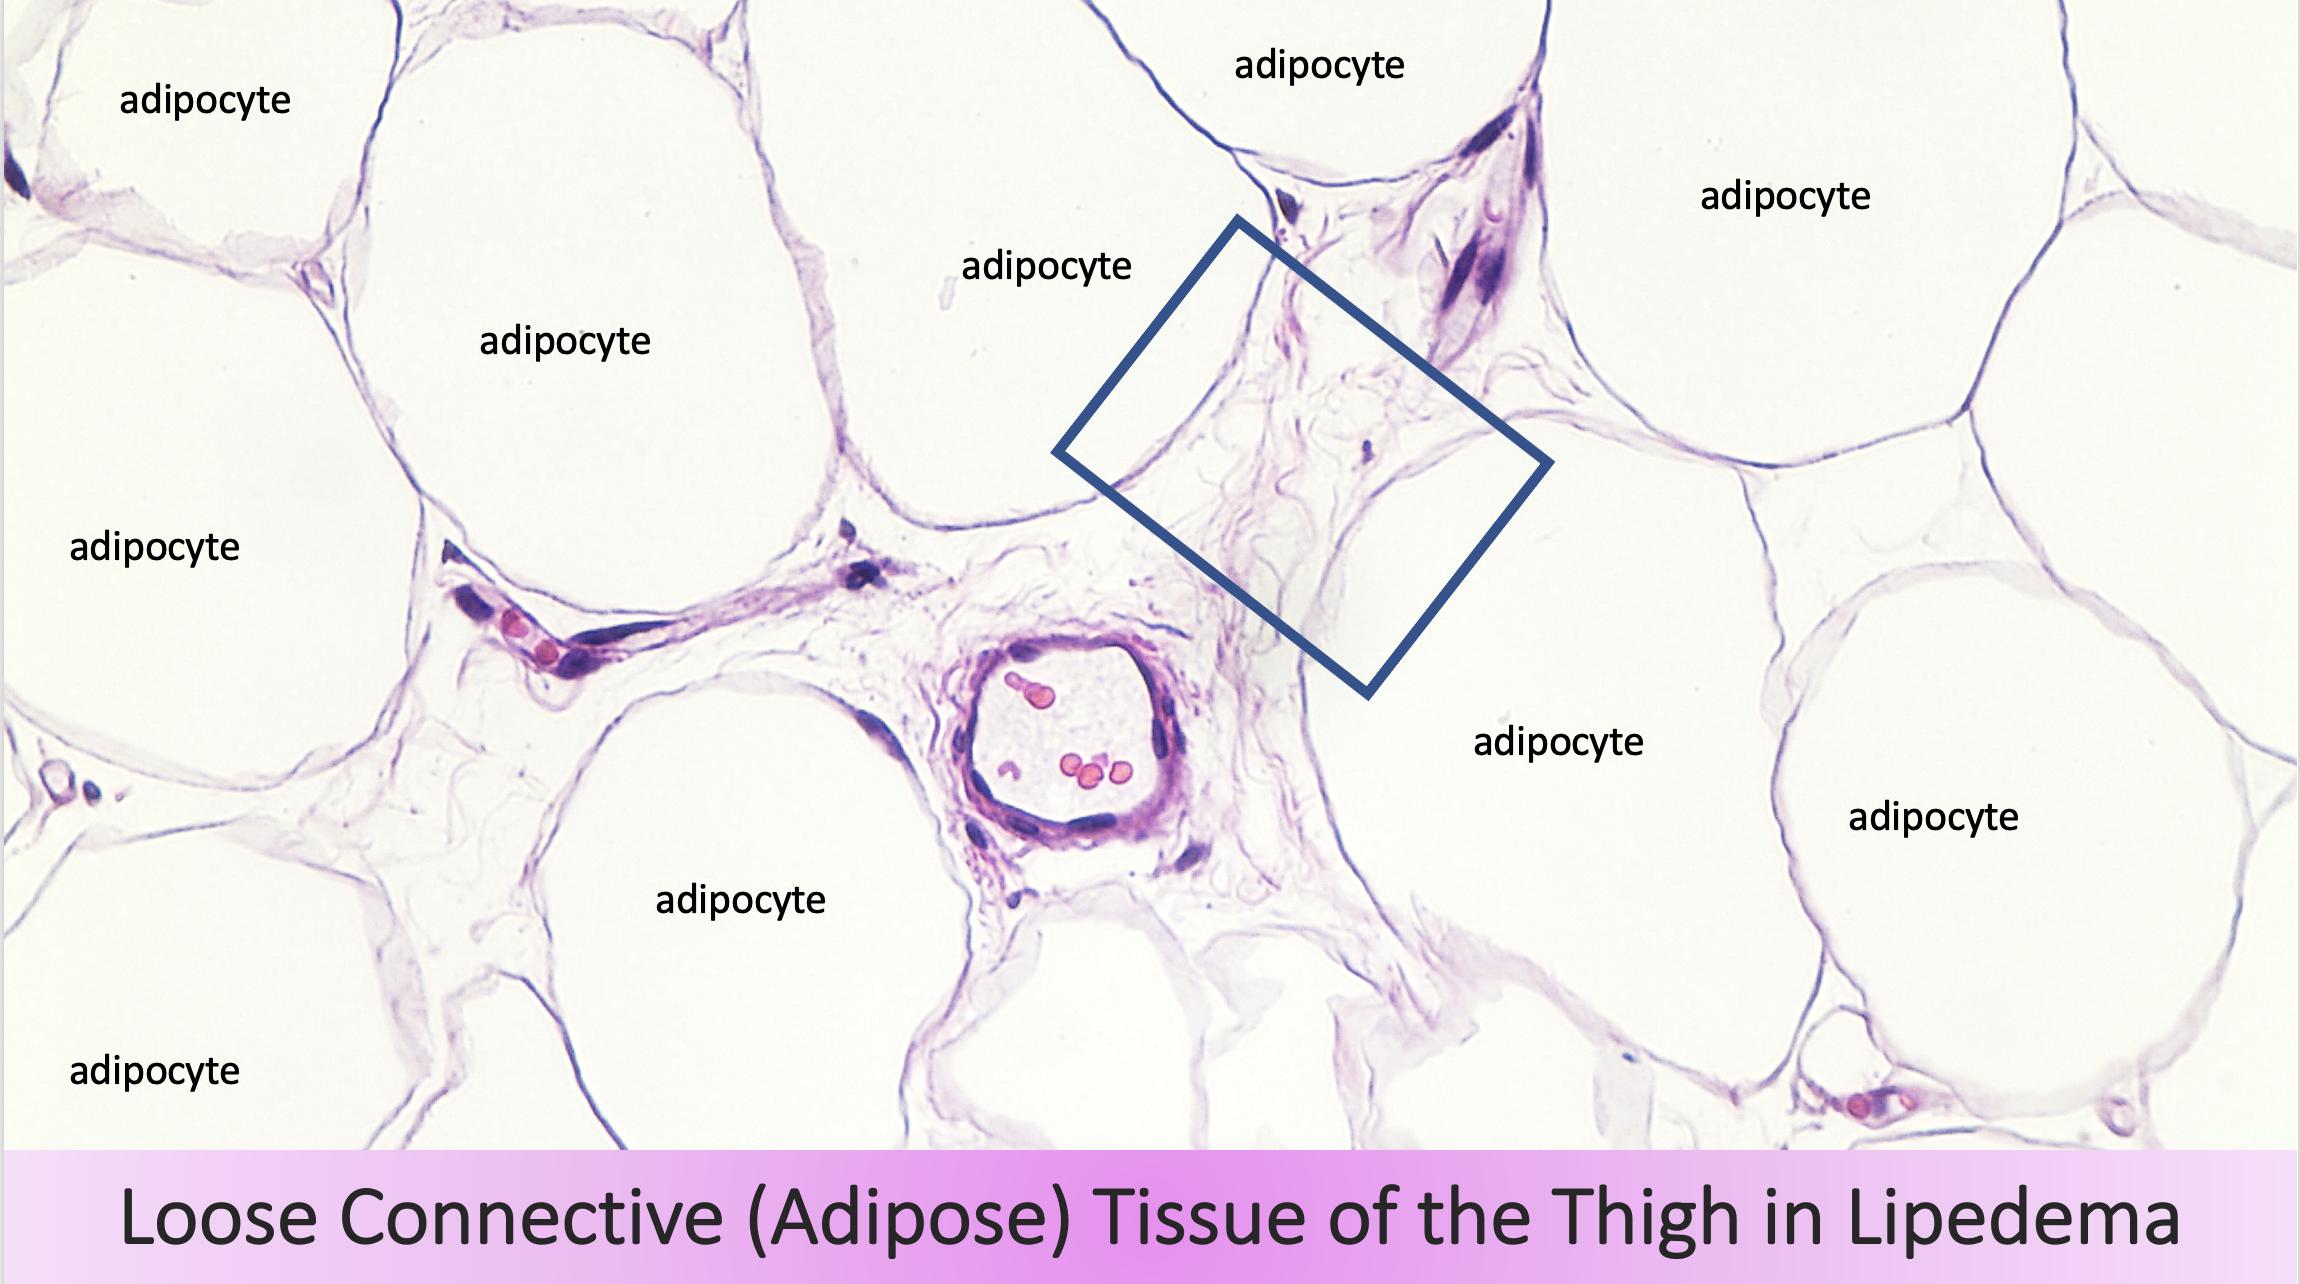 Loose adipose tissue Lipedema, copyright Karen L. Herbst, MD, PhD, 2020